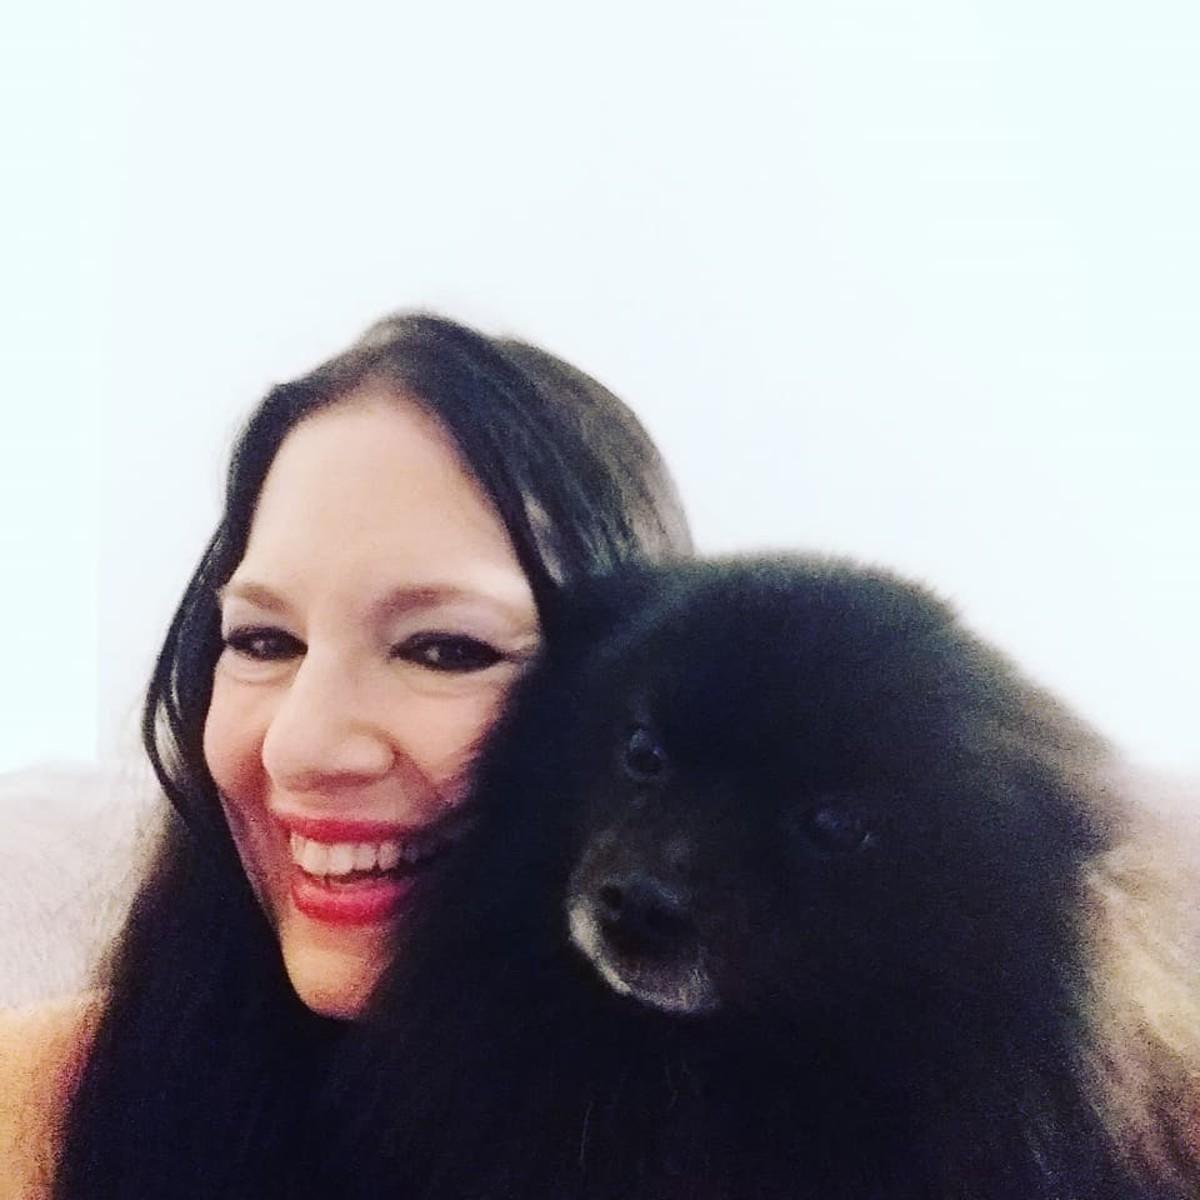 Author Andrea Picarelli of Orlando, Florida, with her beloved Pomeranian, Oliver.